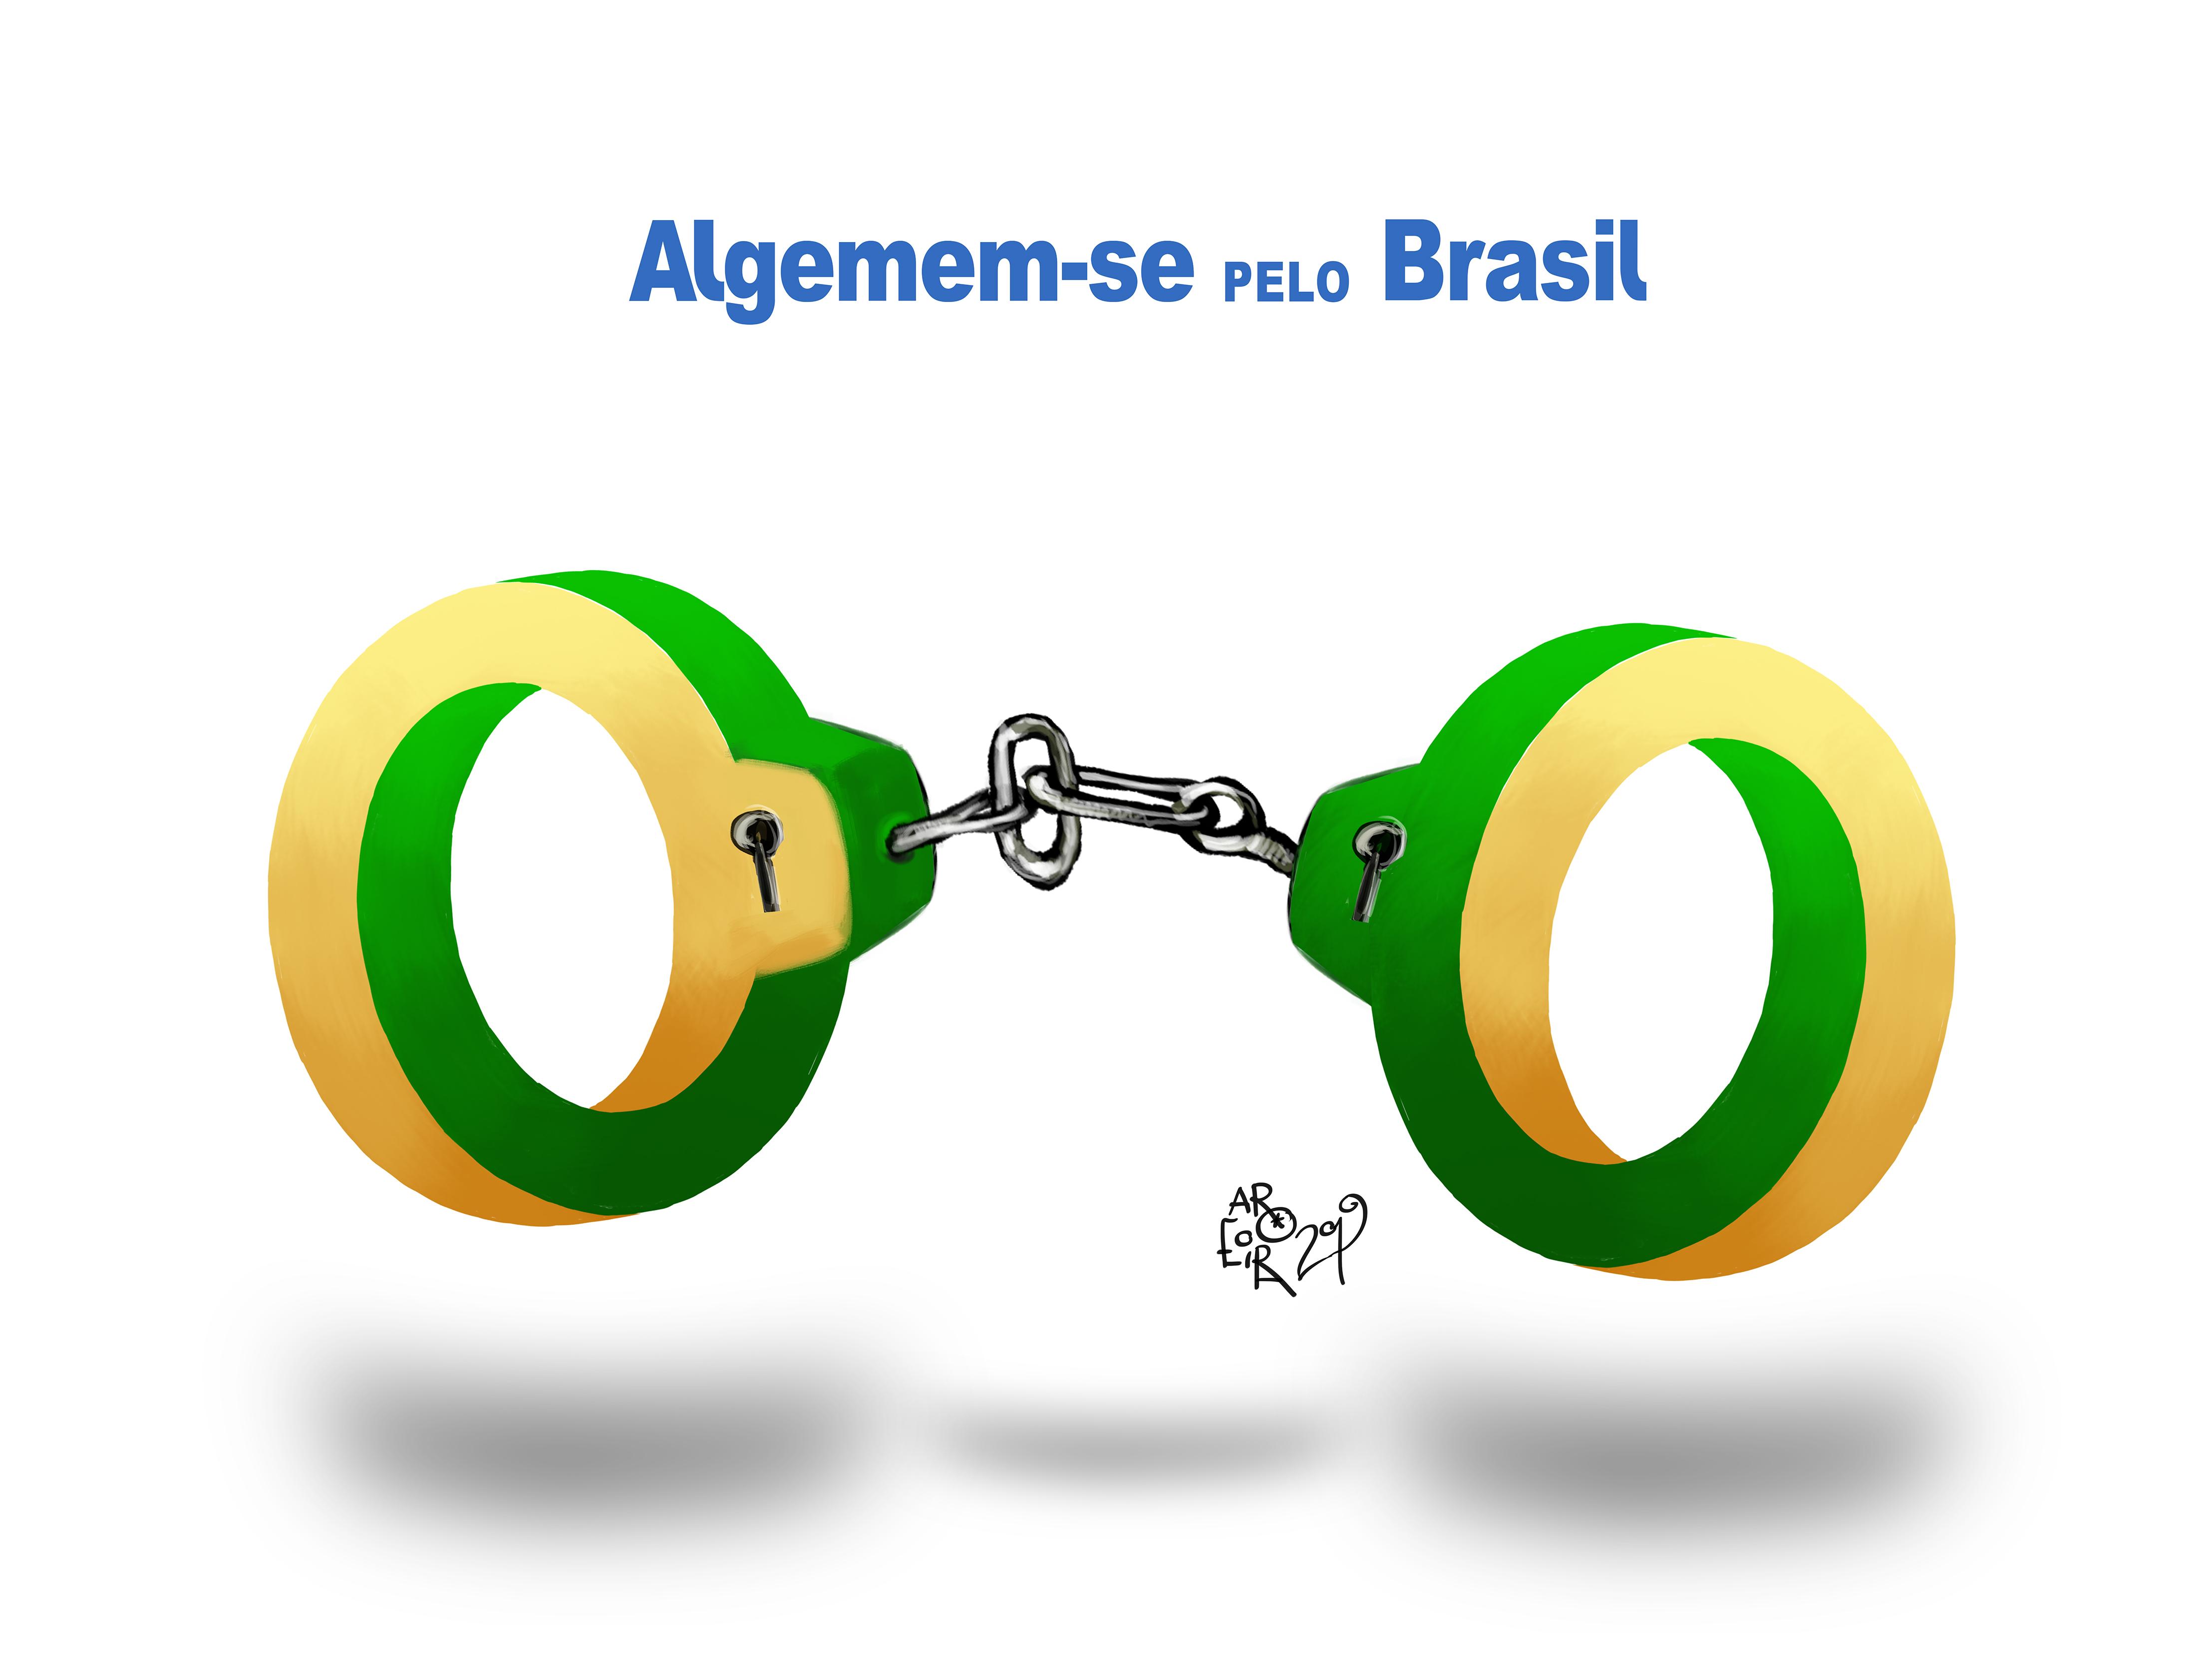 Imagem do Dia: Algemem-se pelo Brasil